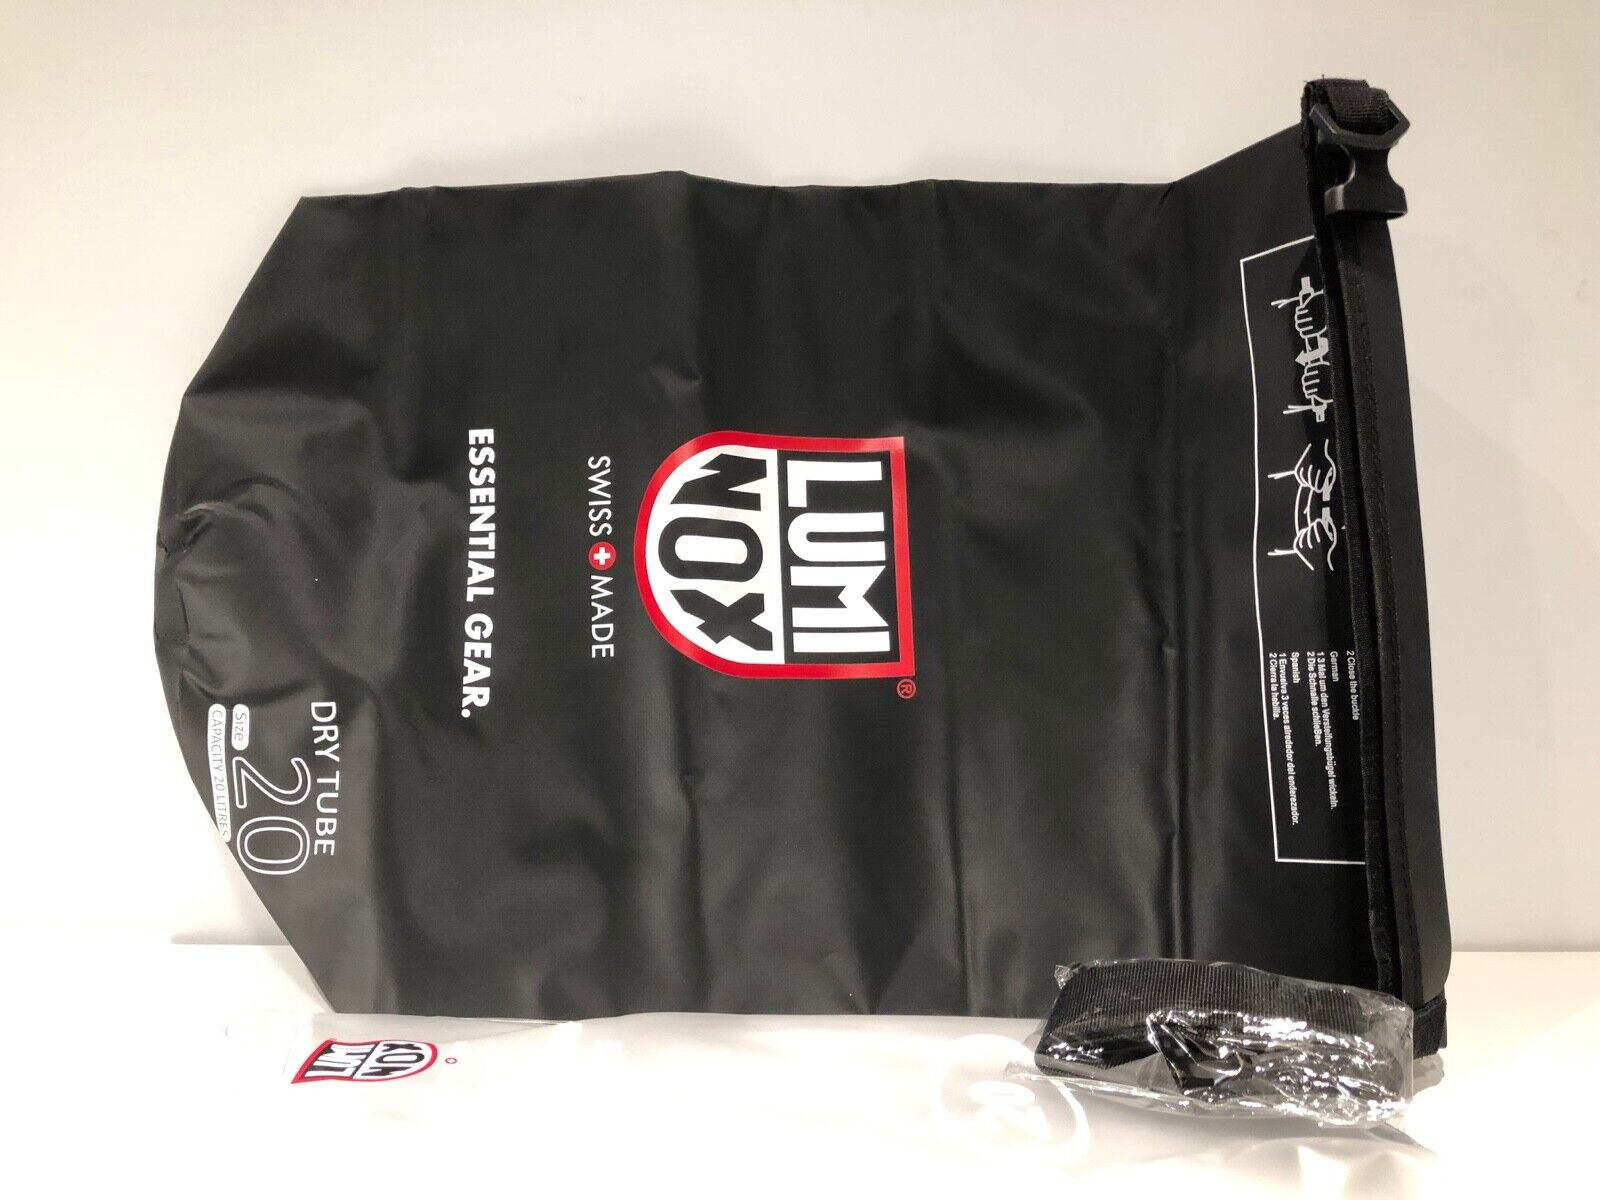 New - LUMINOX - Dry Tube 20 Litres - Waterproof Dry Bag - Bolsa impermeable